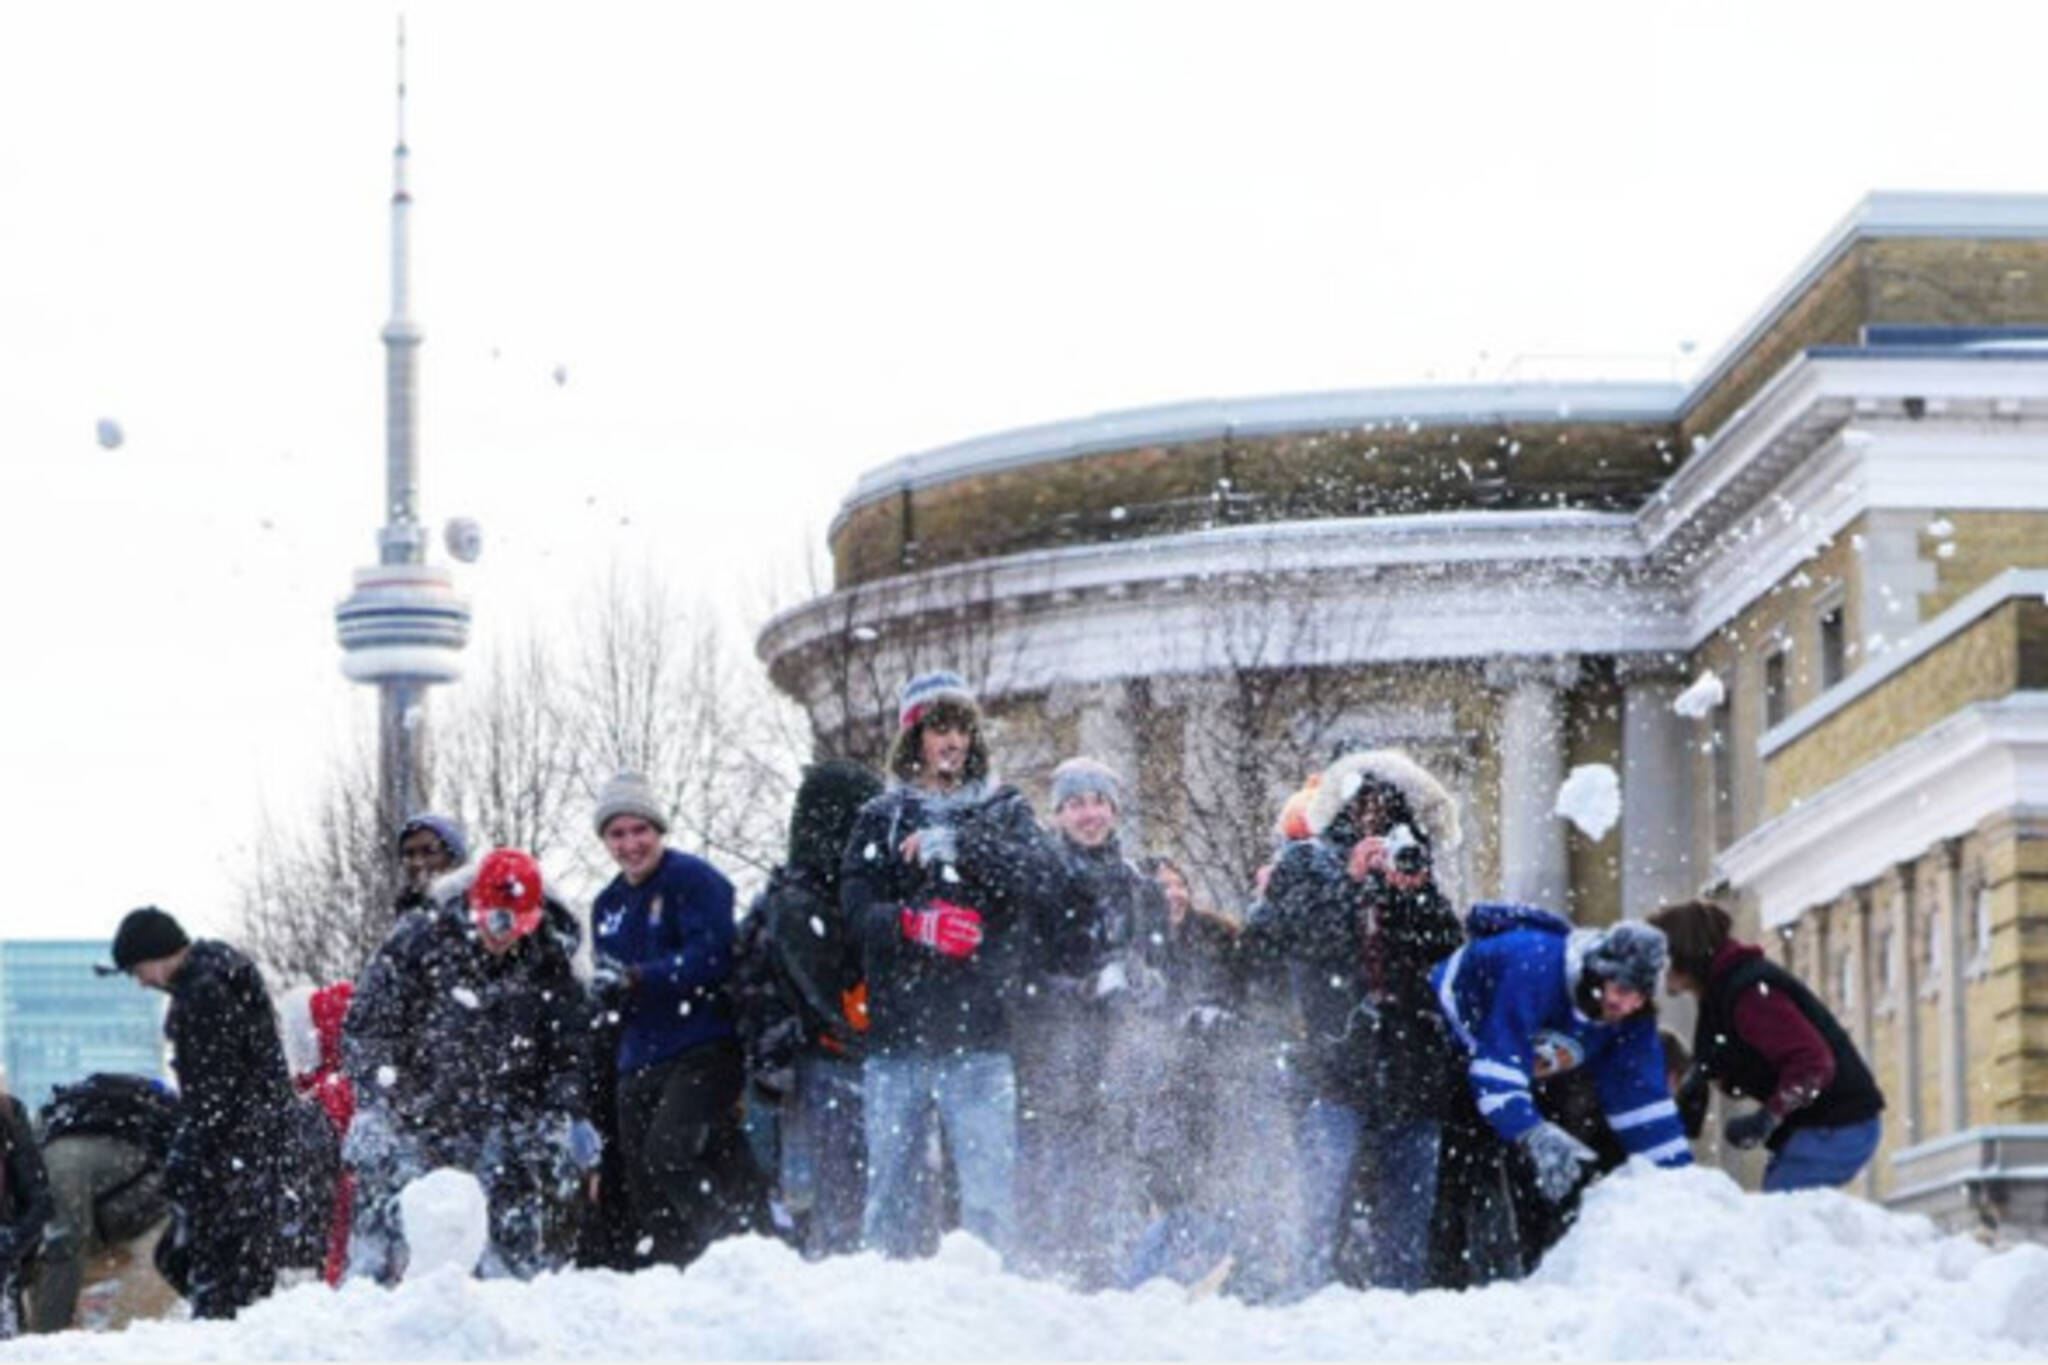 Toronto Snow Ball